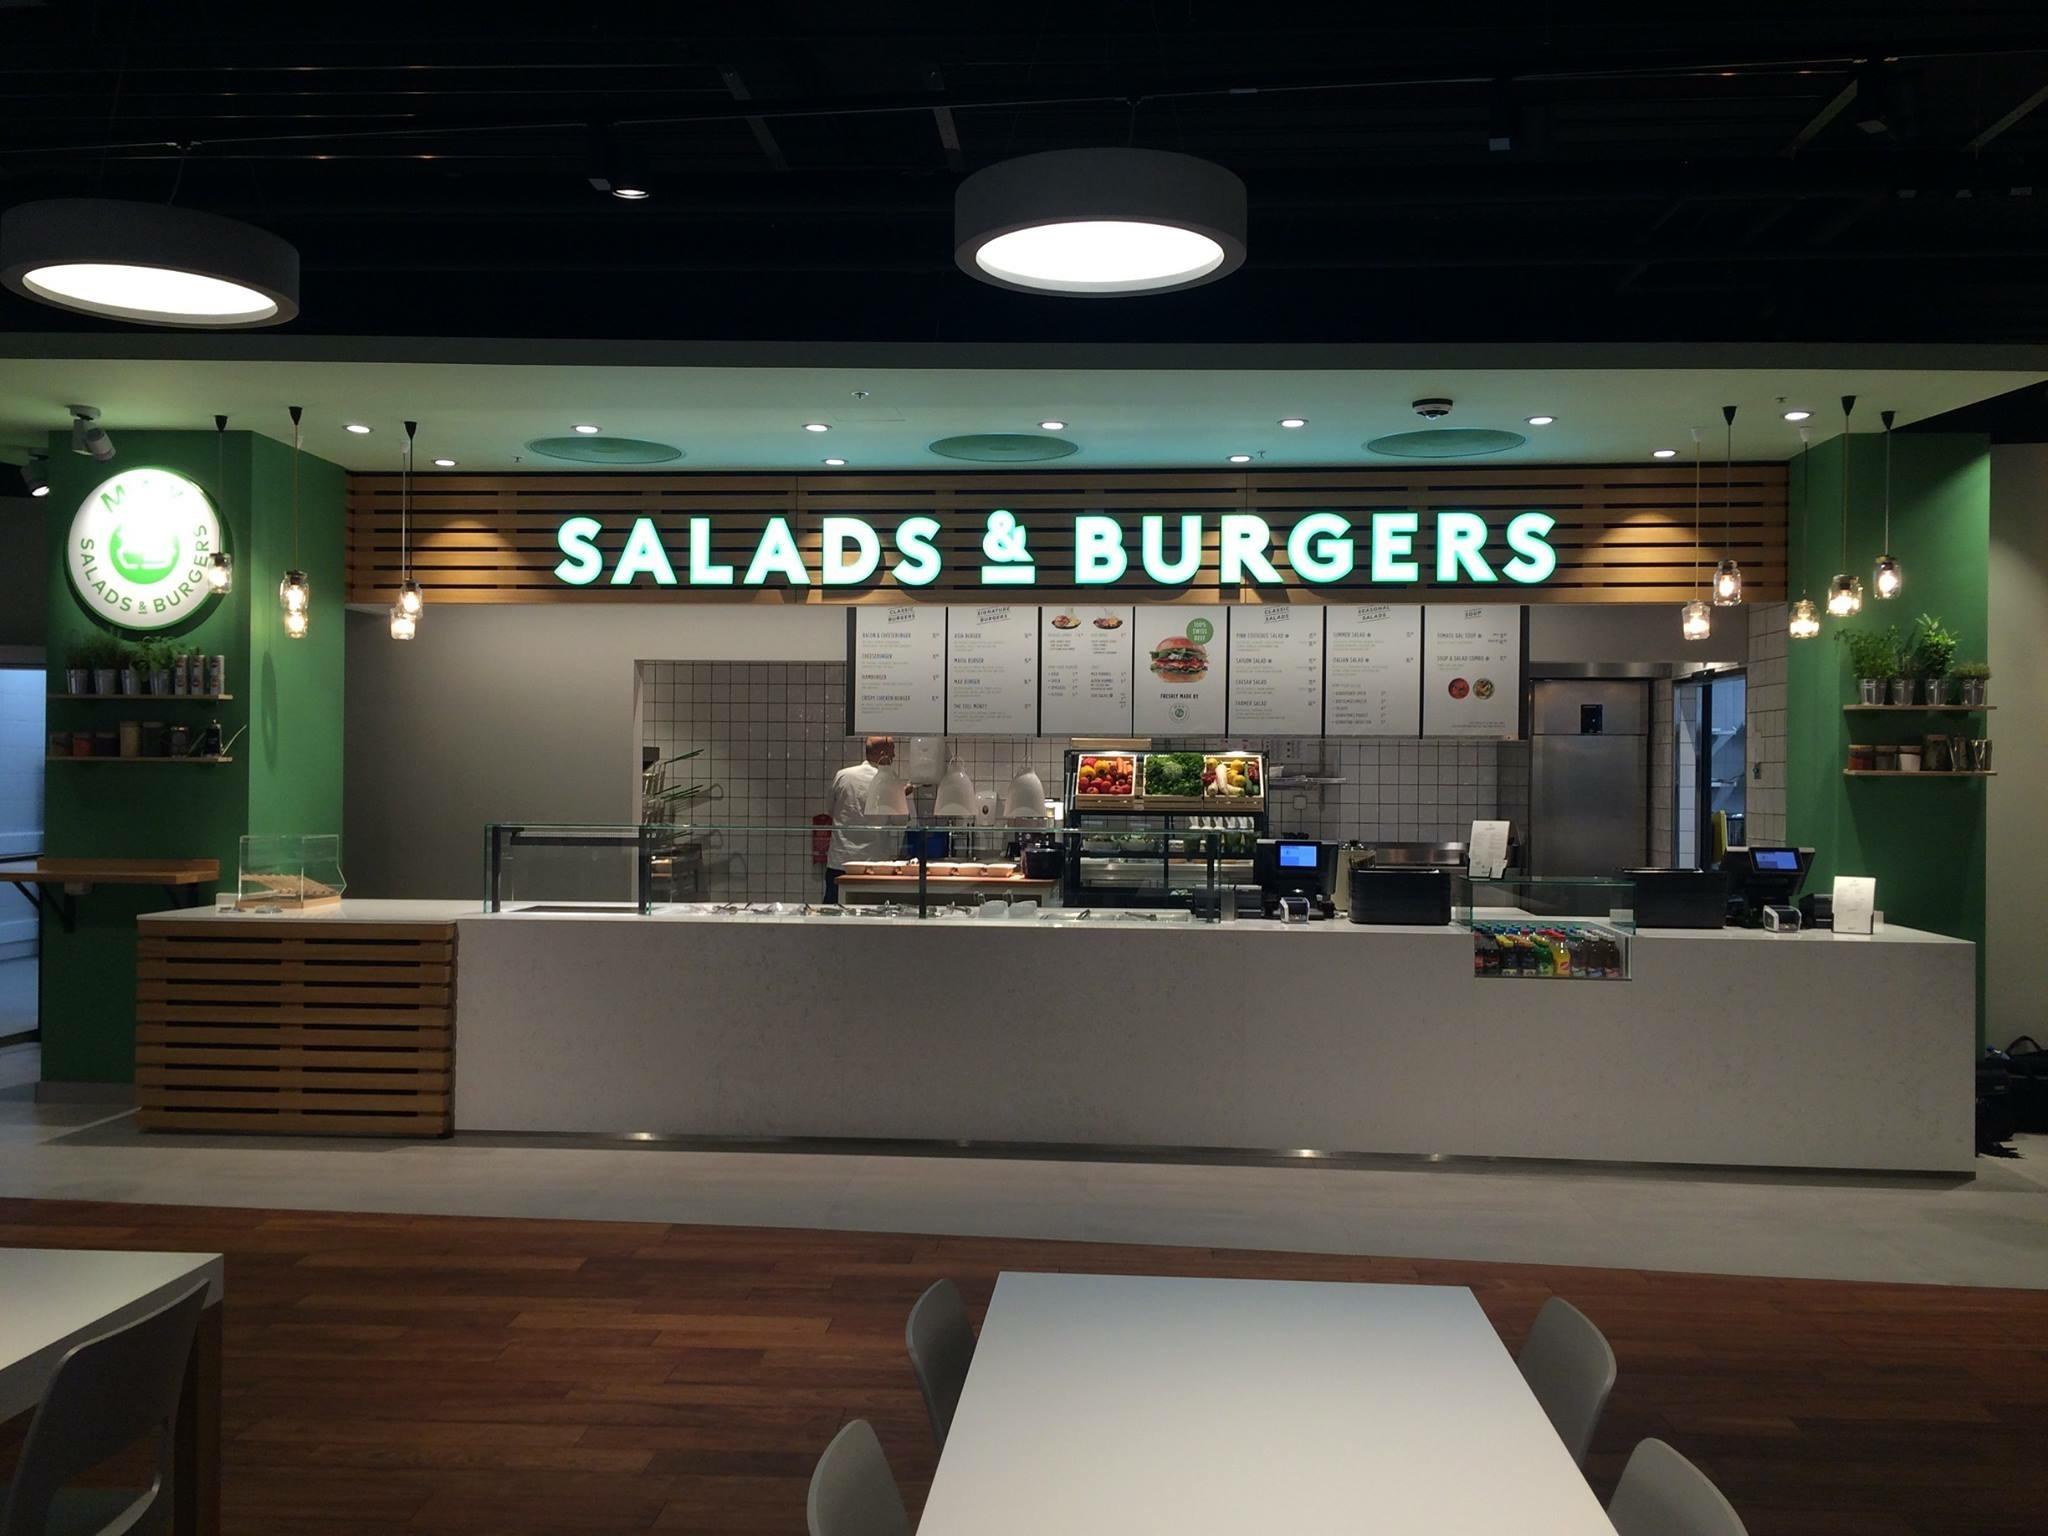 Max Salads & Burgers Tivoli Spreitenbach